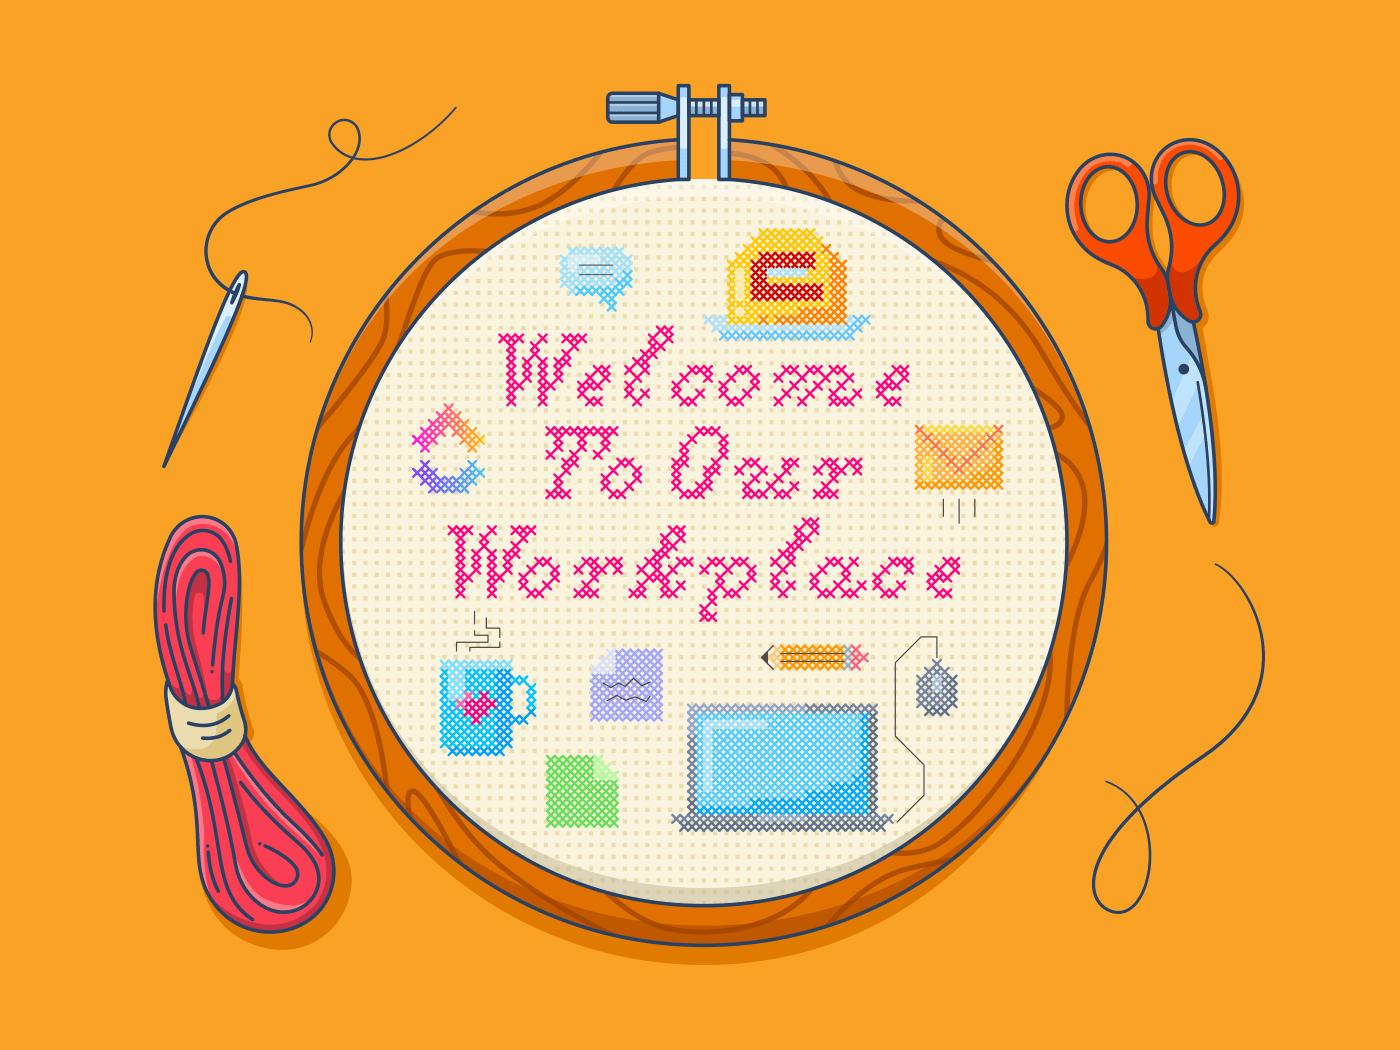 Welcoming new team members cross stitch illo